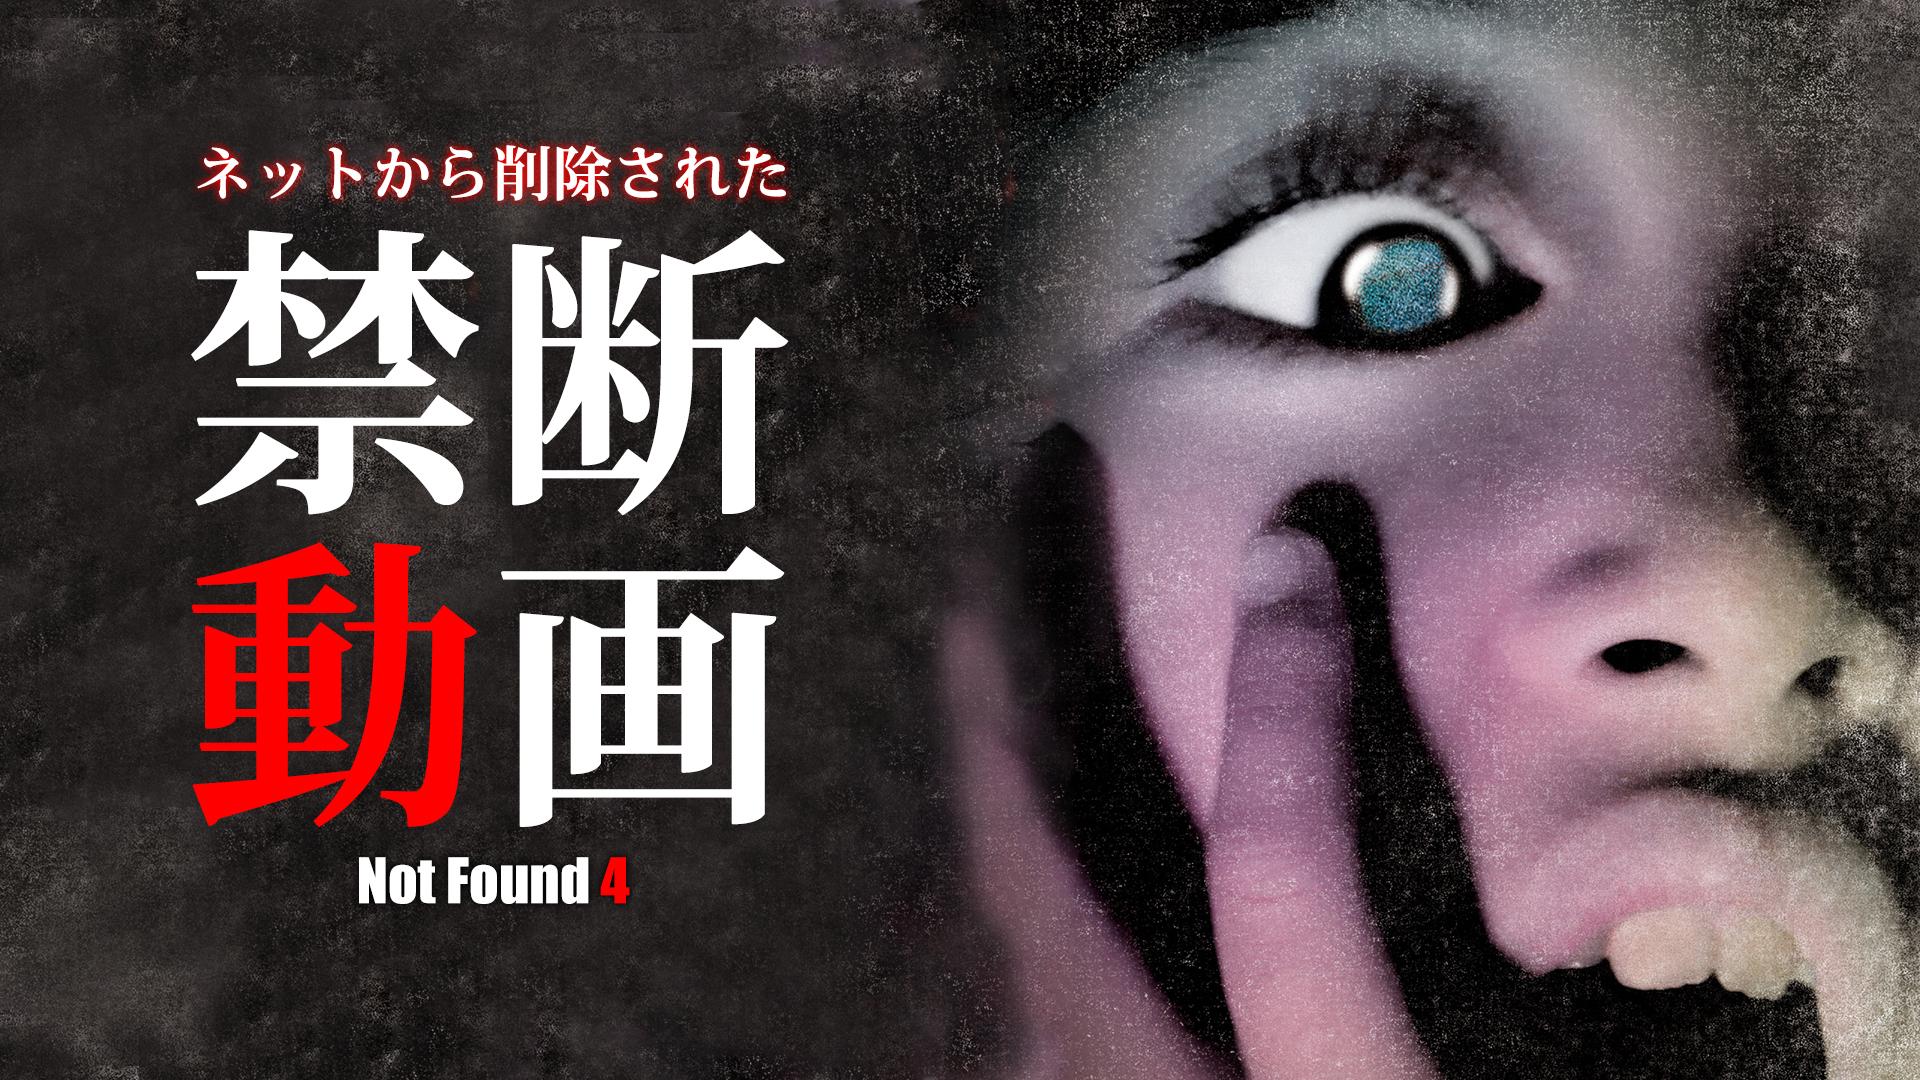 Not Found4 -ネットから削除された禁断動画-